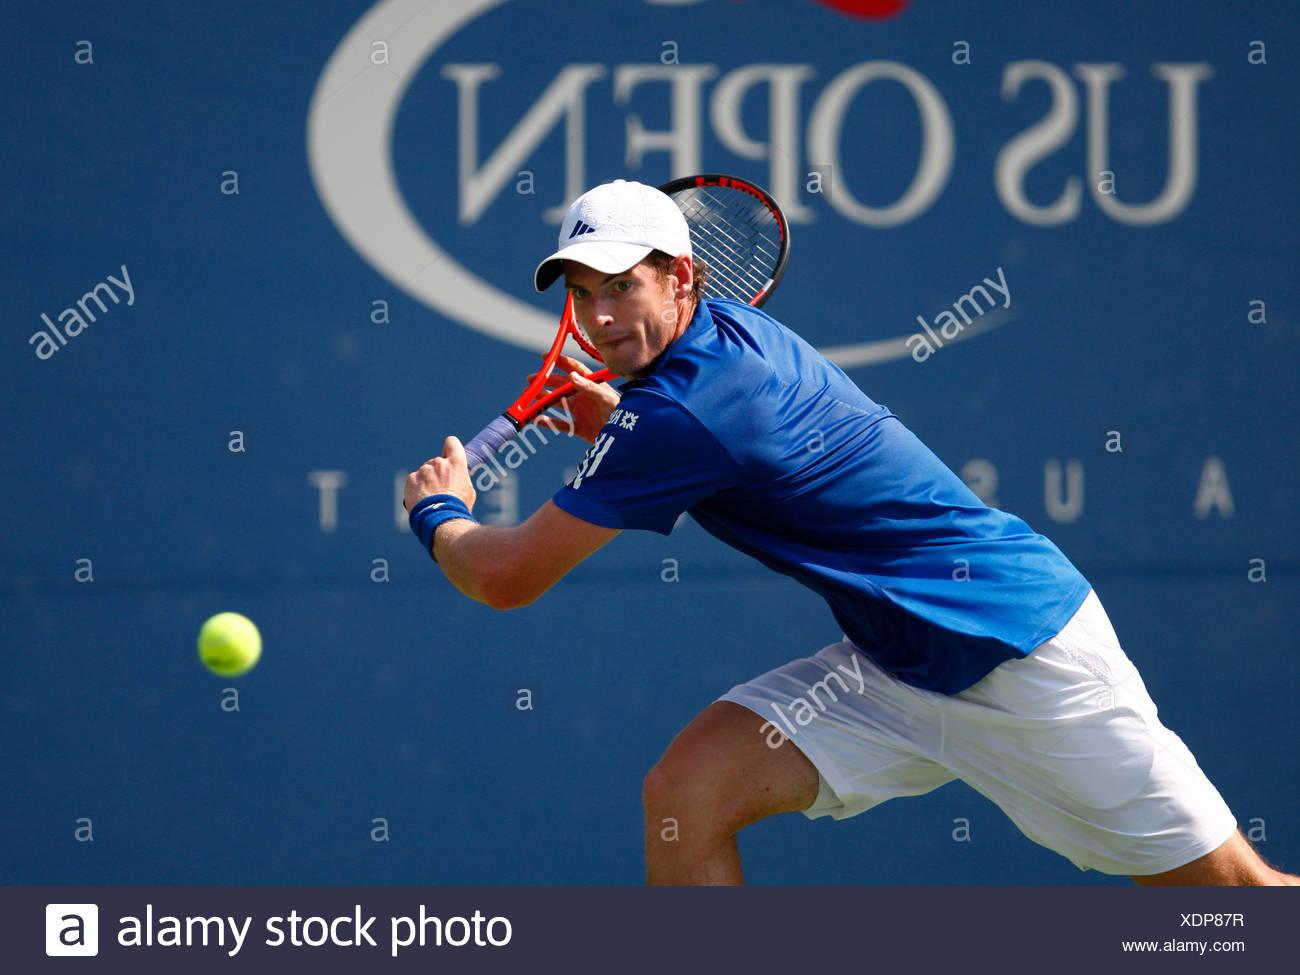 Andy Murray, British tennis player, US Open 2010, ITF Grand Slam Tennis Tournament, USTA Billie Jean King National Tennis Center - Stock Image